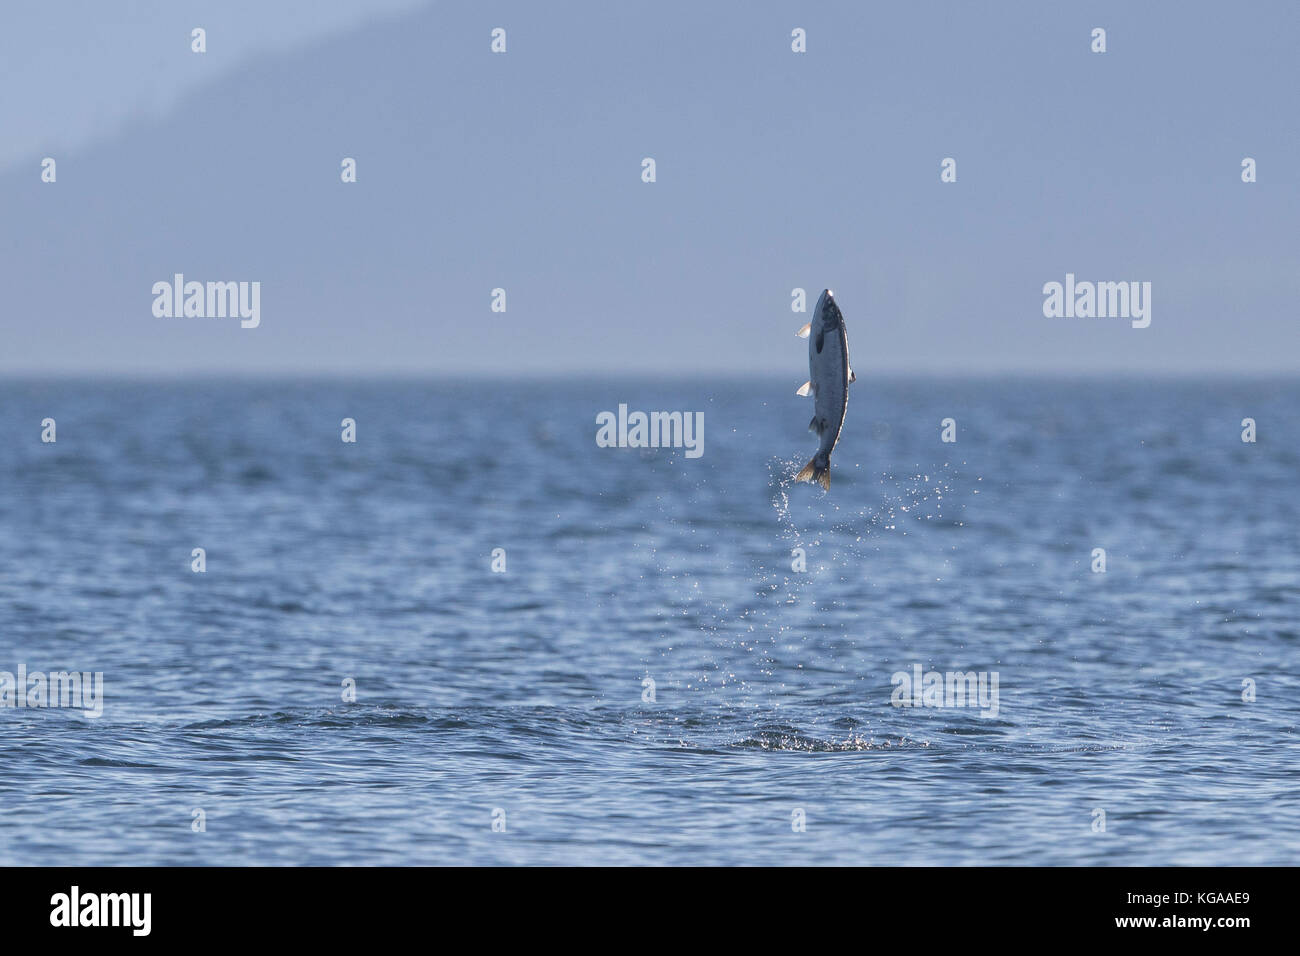 Jumping Salmon, Alaska - Stock Image